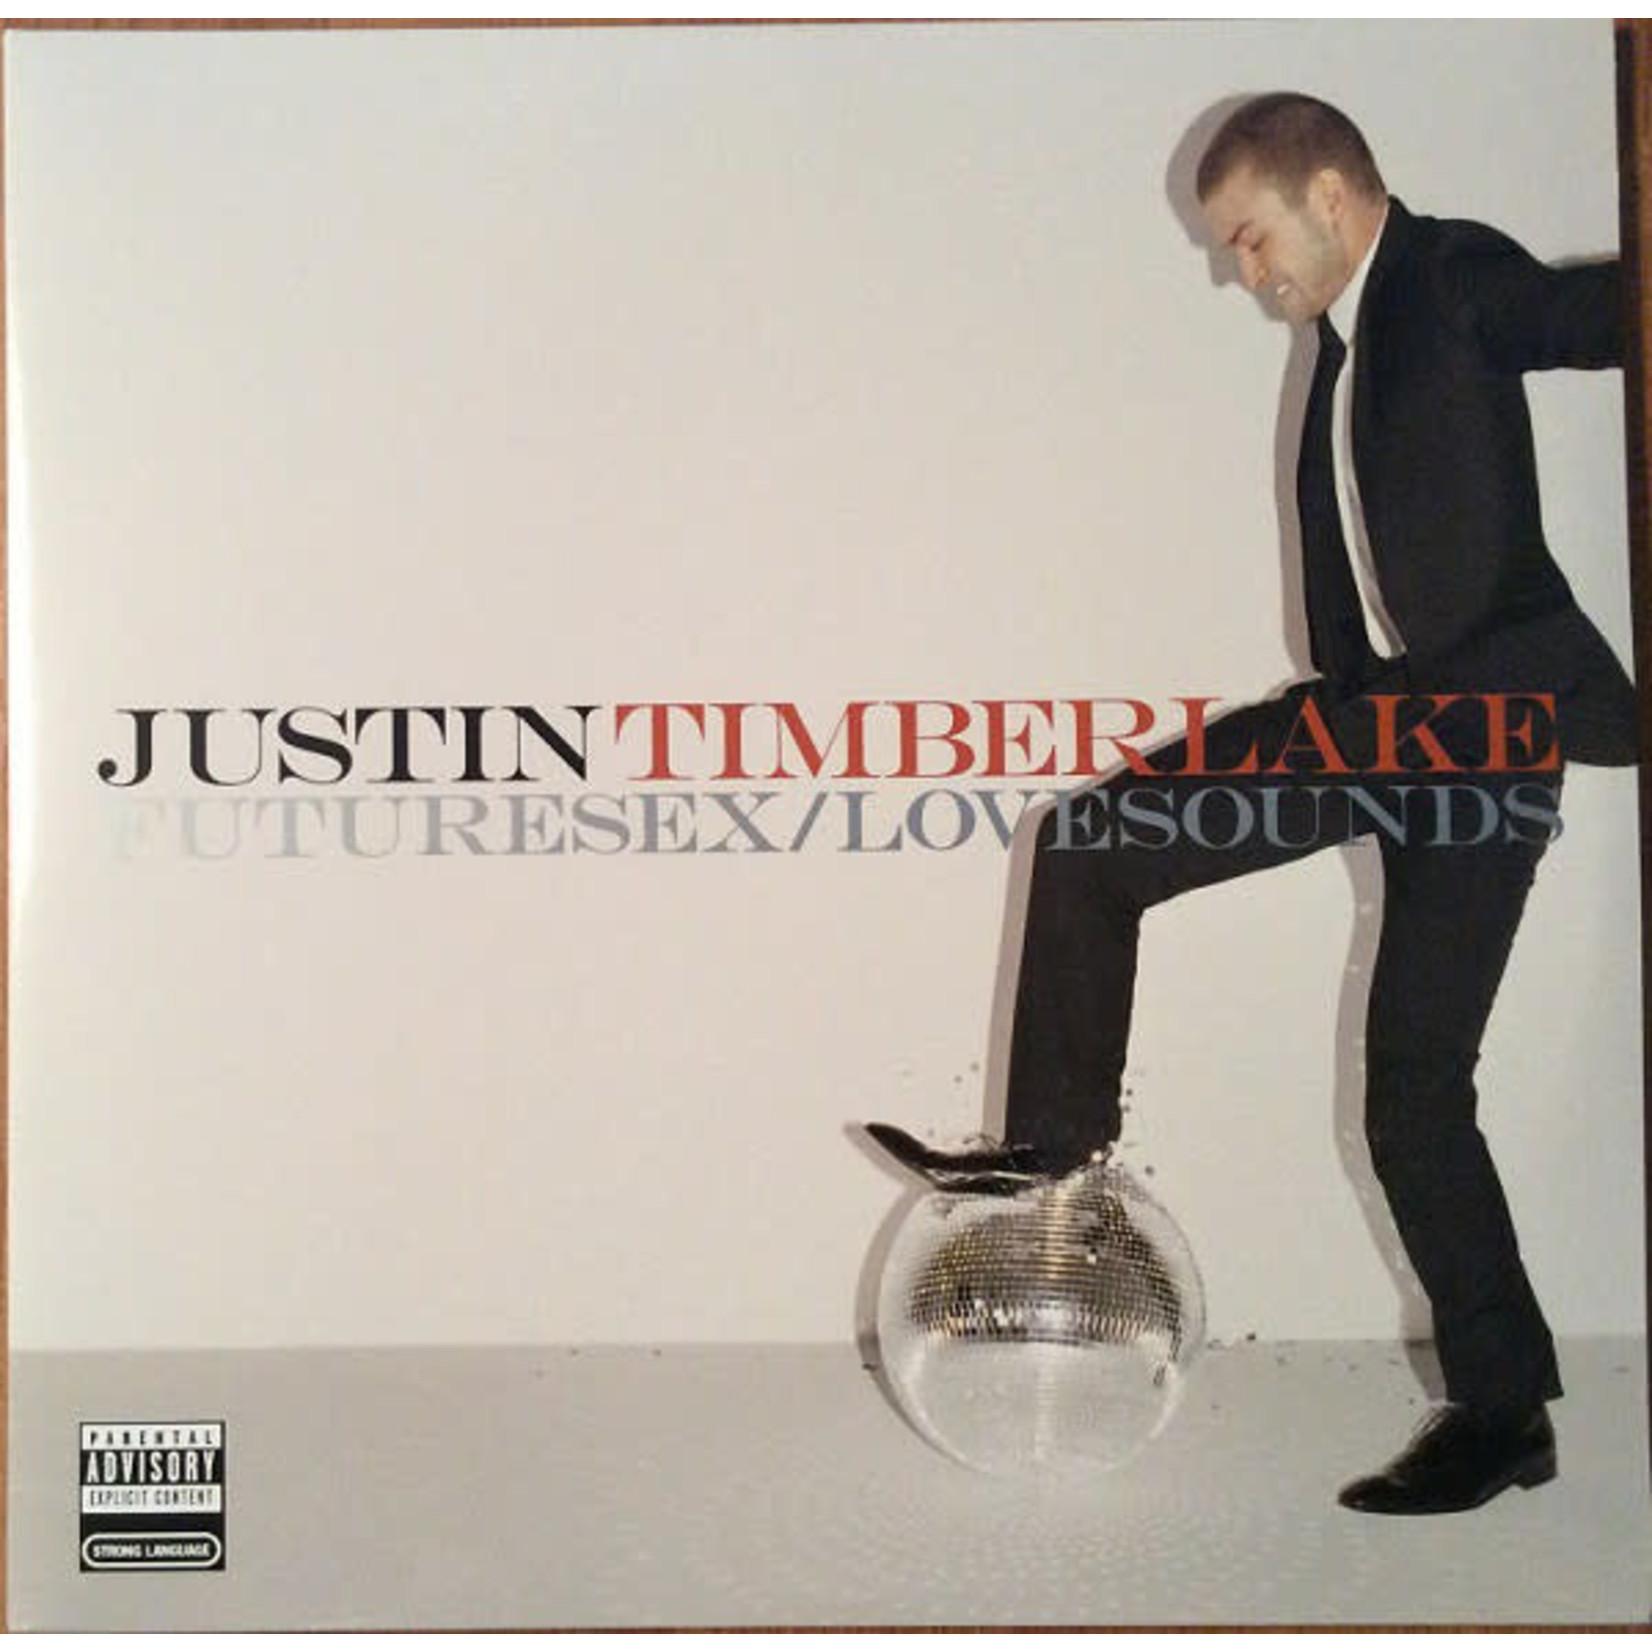 JUSTIN TIMBERLAKE FUTURE SEX/LOVE SOUNDS